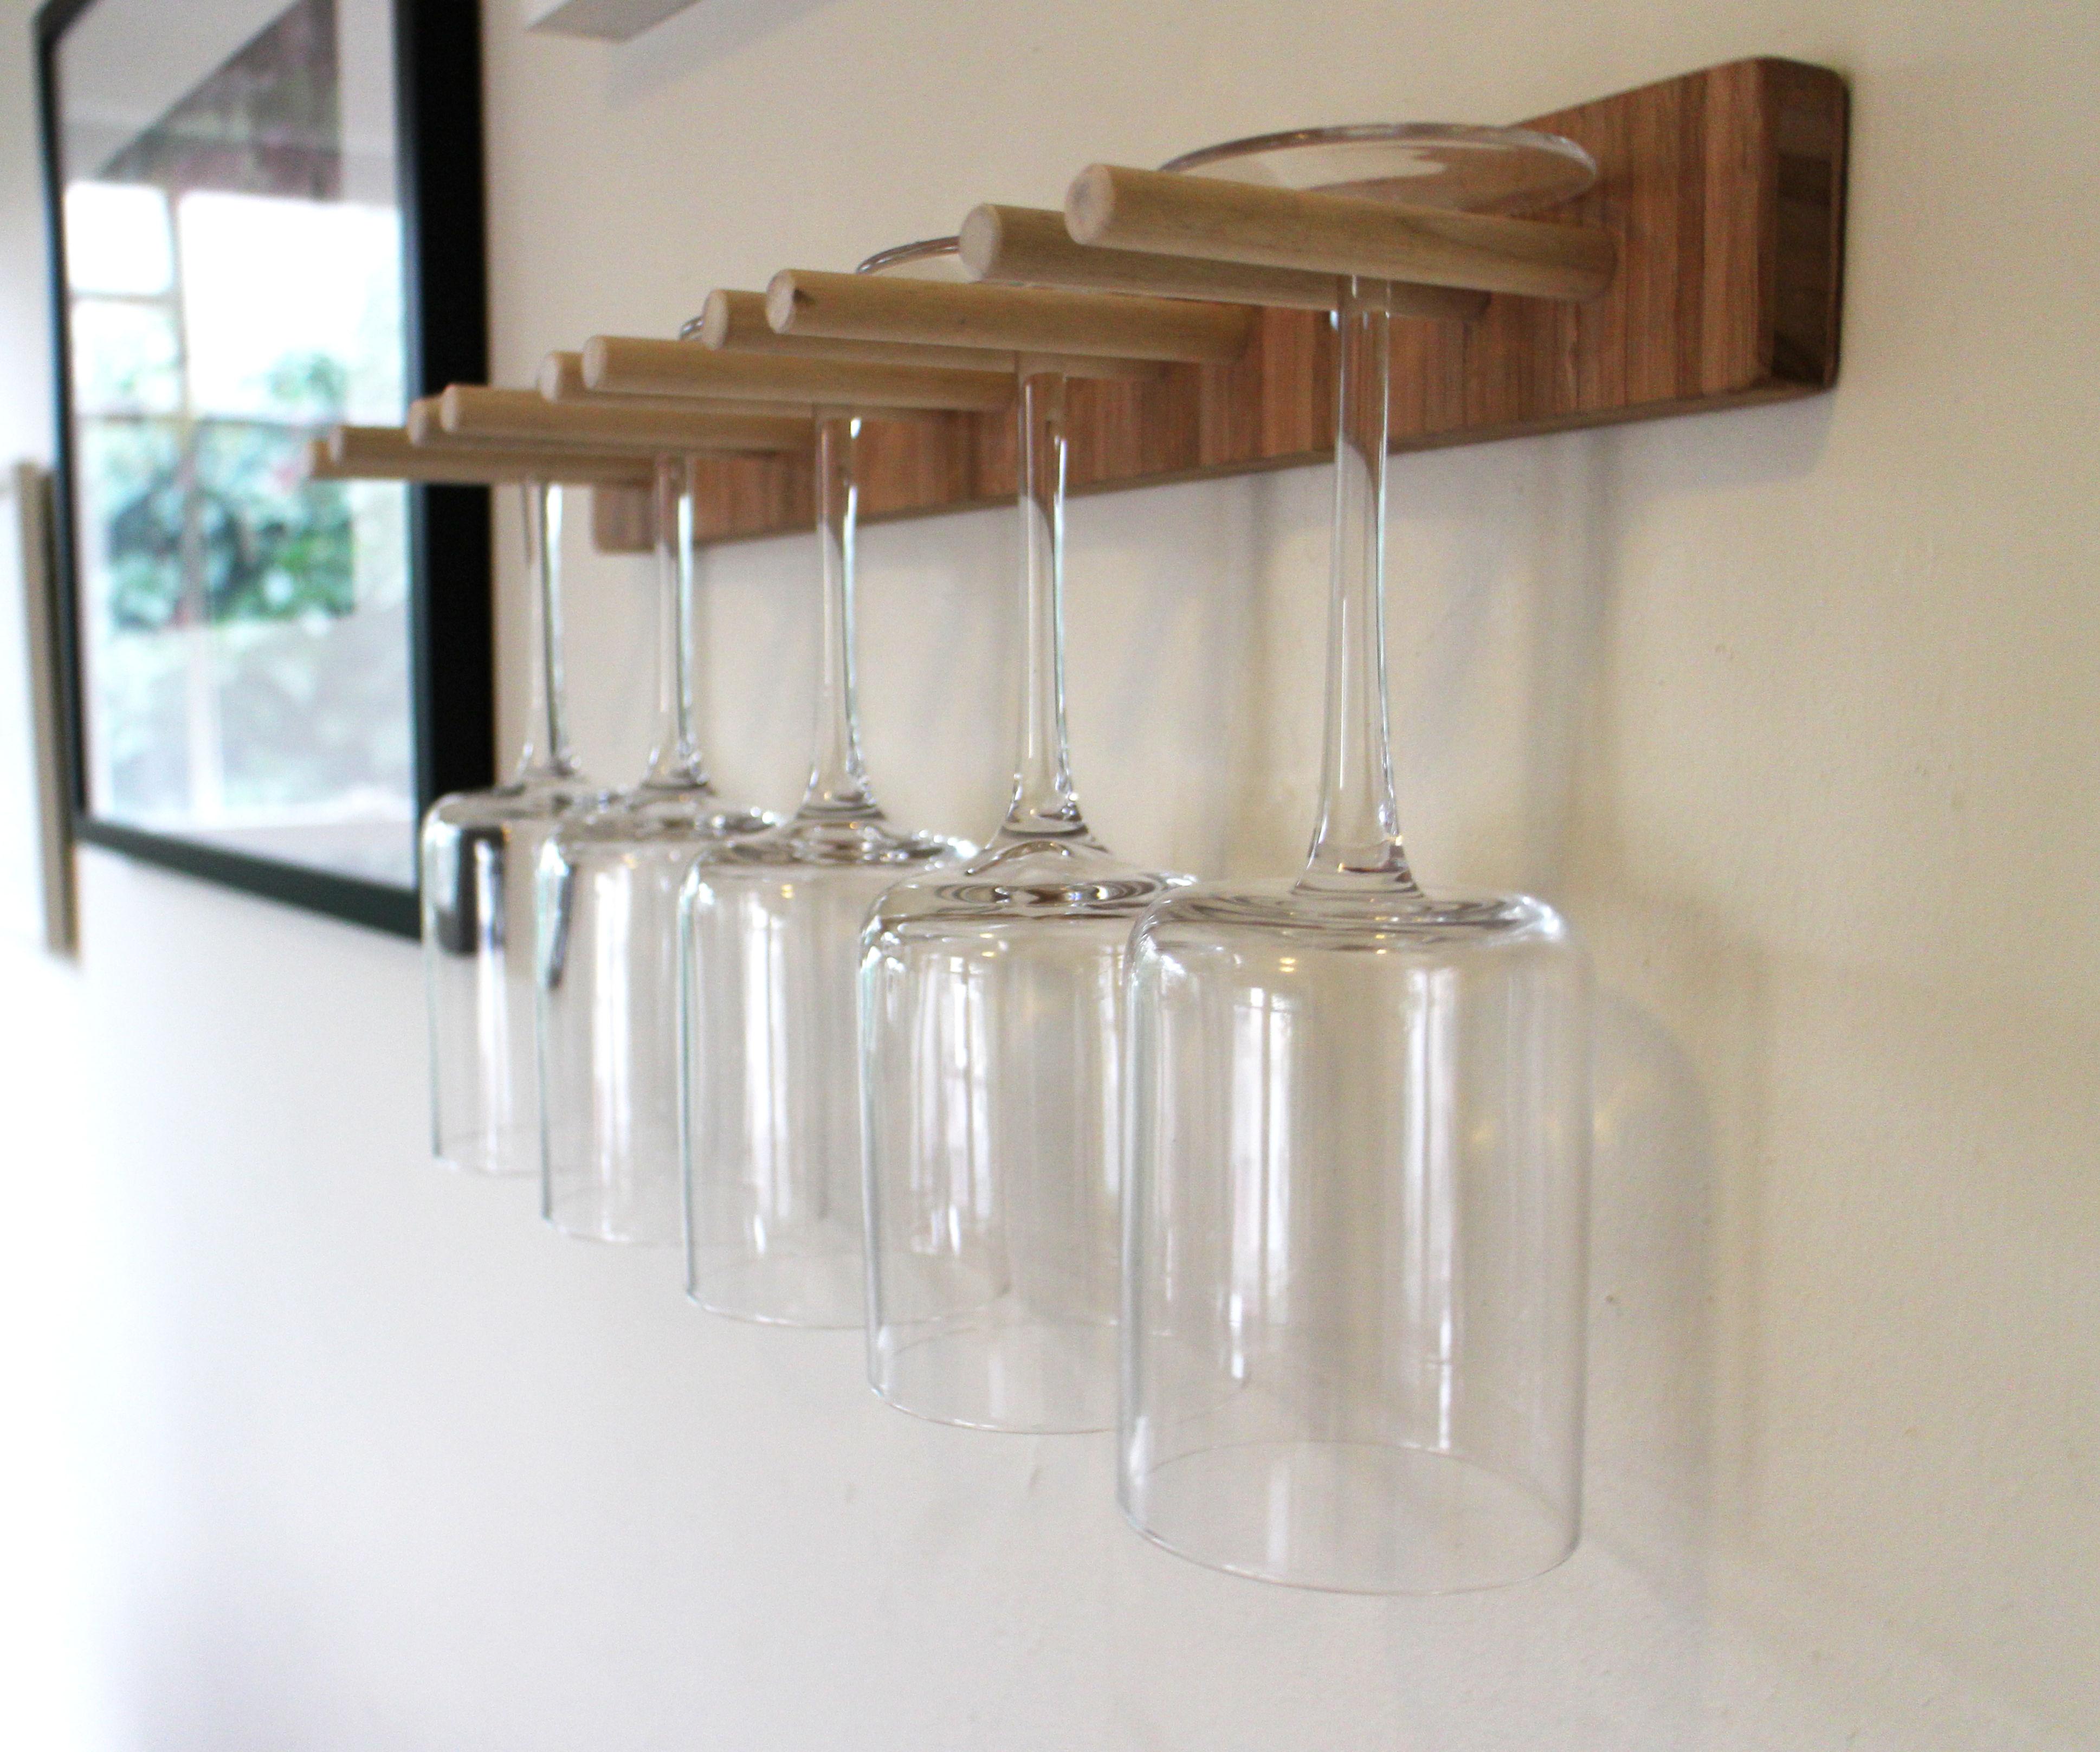 Scrap Wood Wine Glass Rack